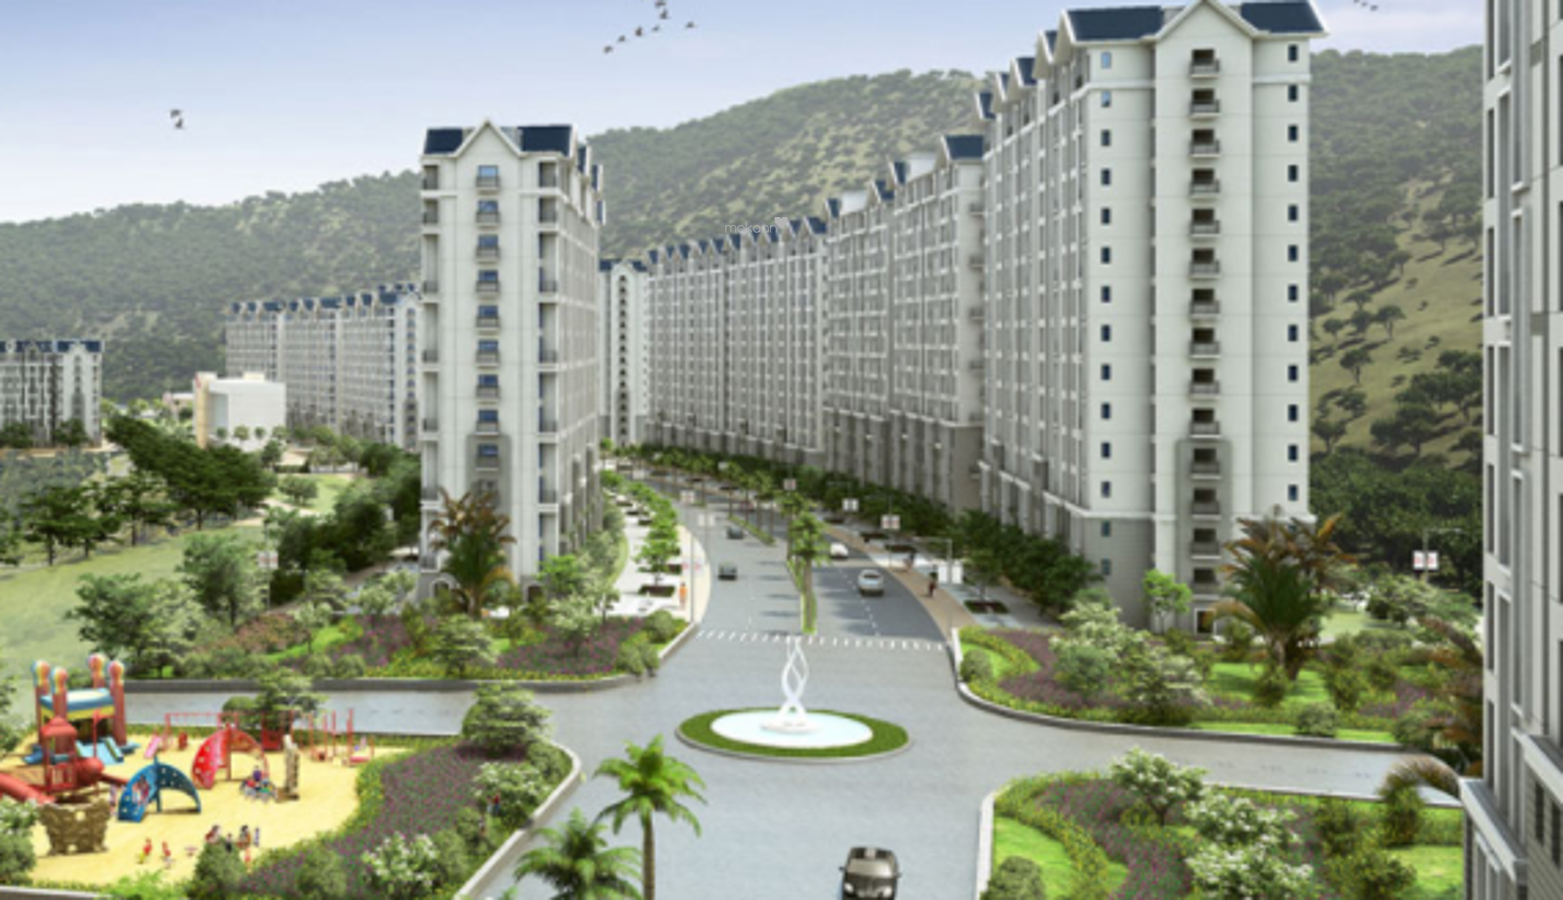 321 sq ft 1BHK 1BHK+1T (321 sq ft) Property By Proptiger In Xrbia, Hinjewadi